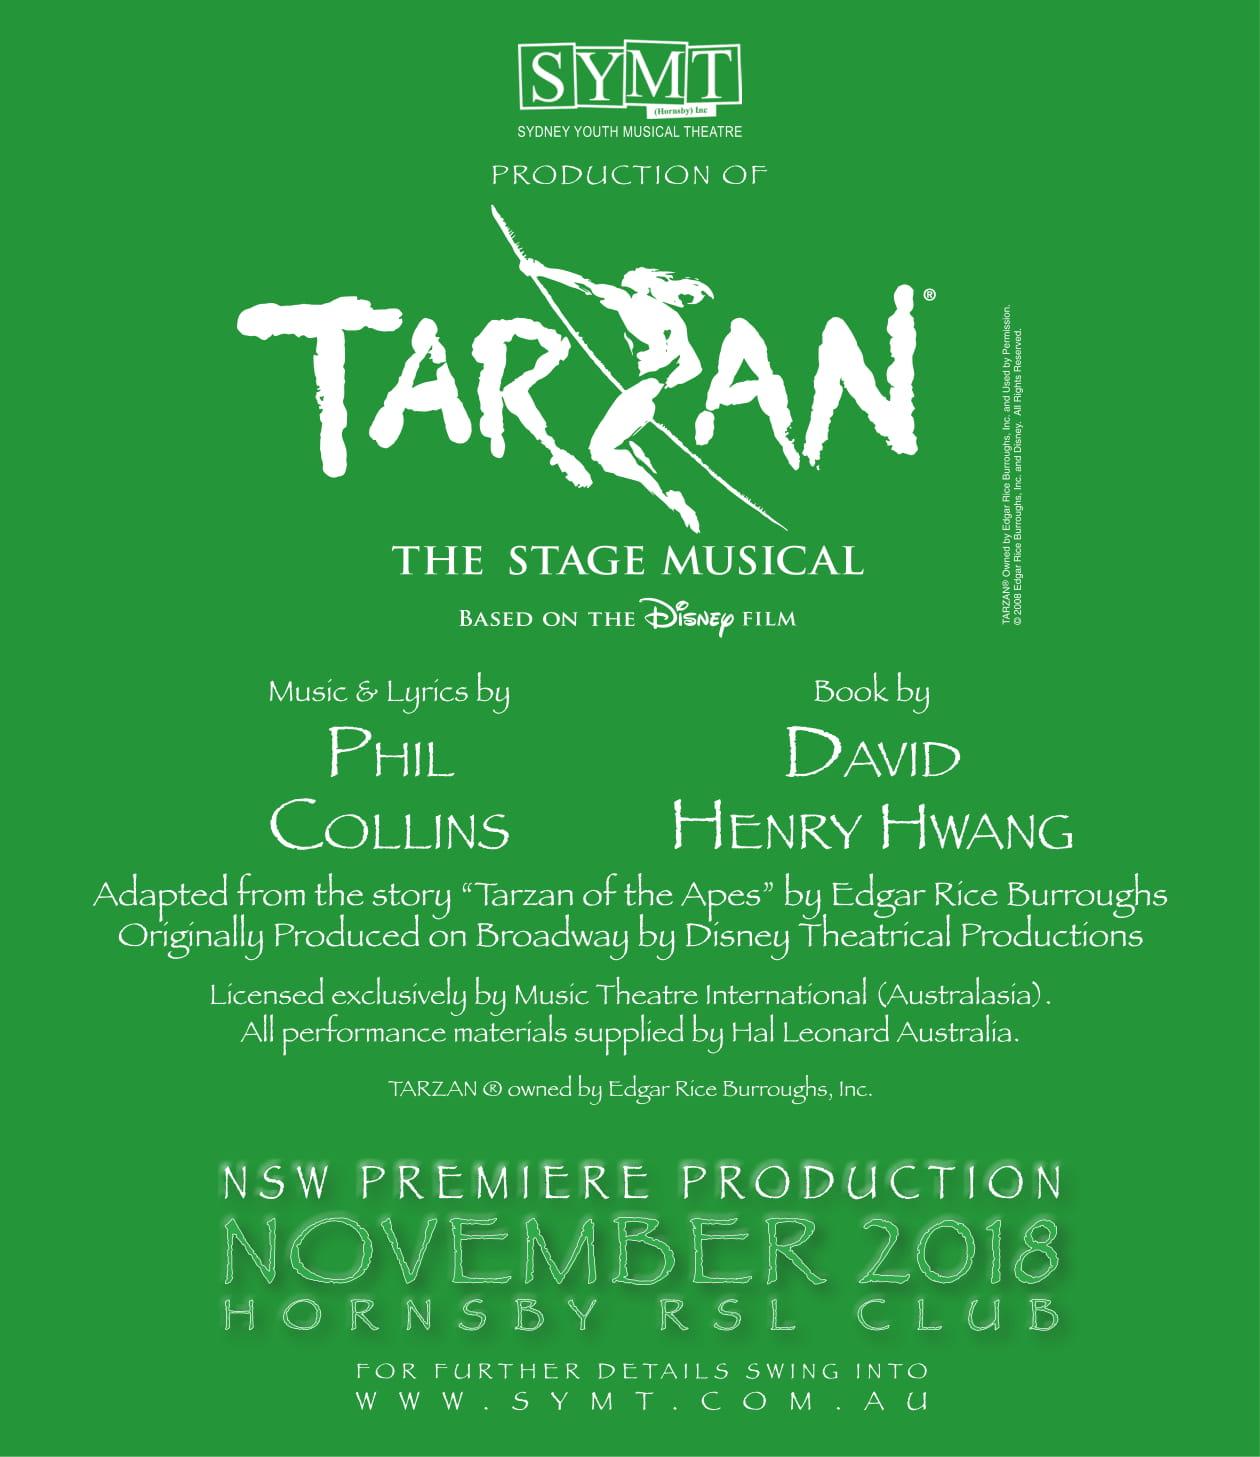 Tarzan Website Announcement-1.jpg